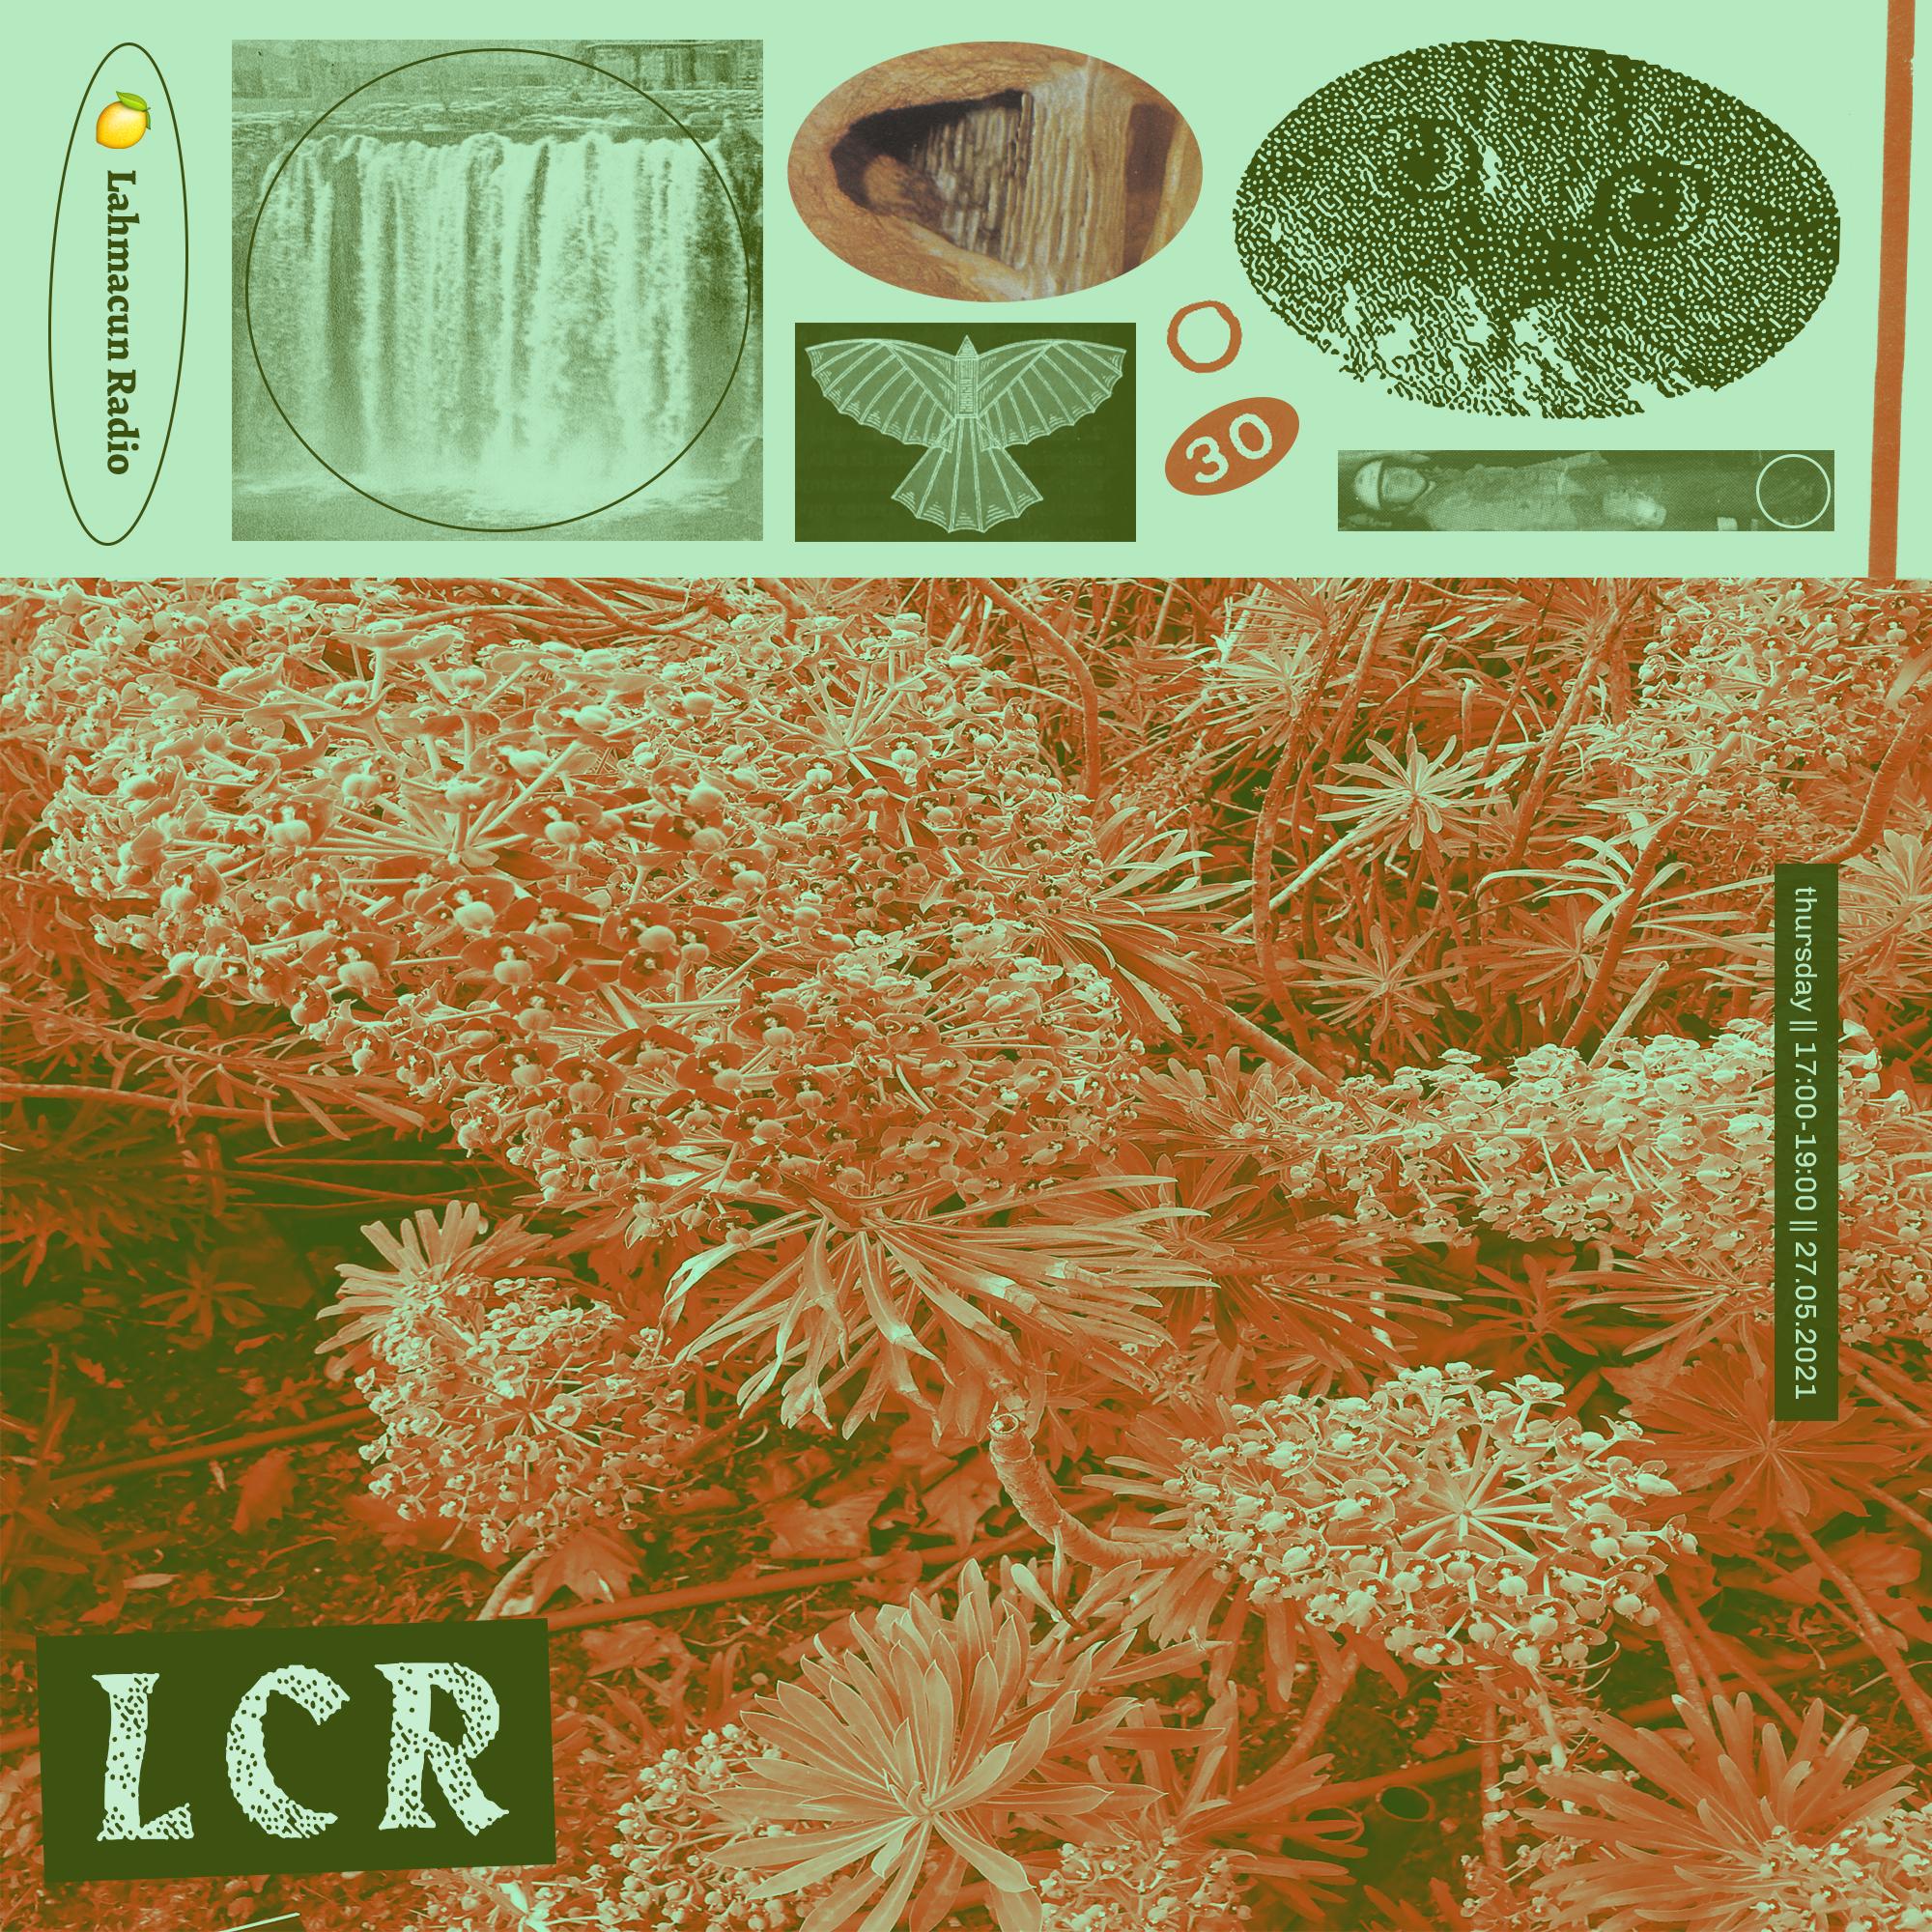 LCR @ Lahmacun Radio /// Cheeky Blinders /// [27.05.21.]